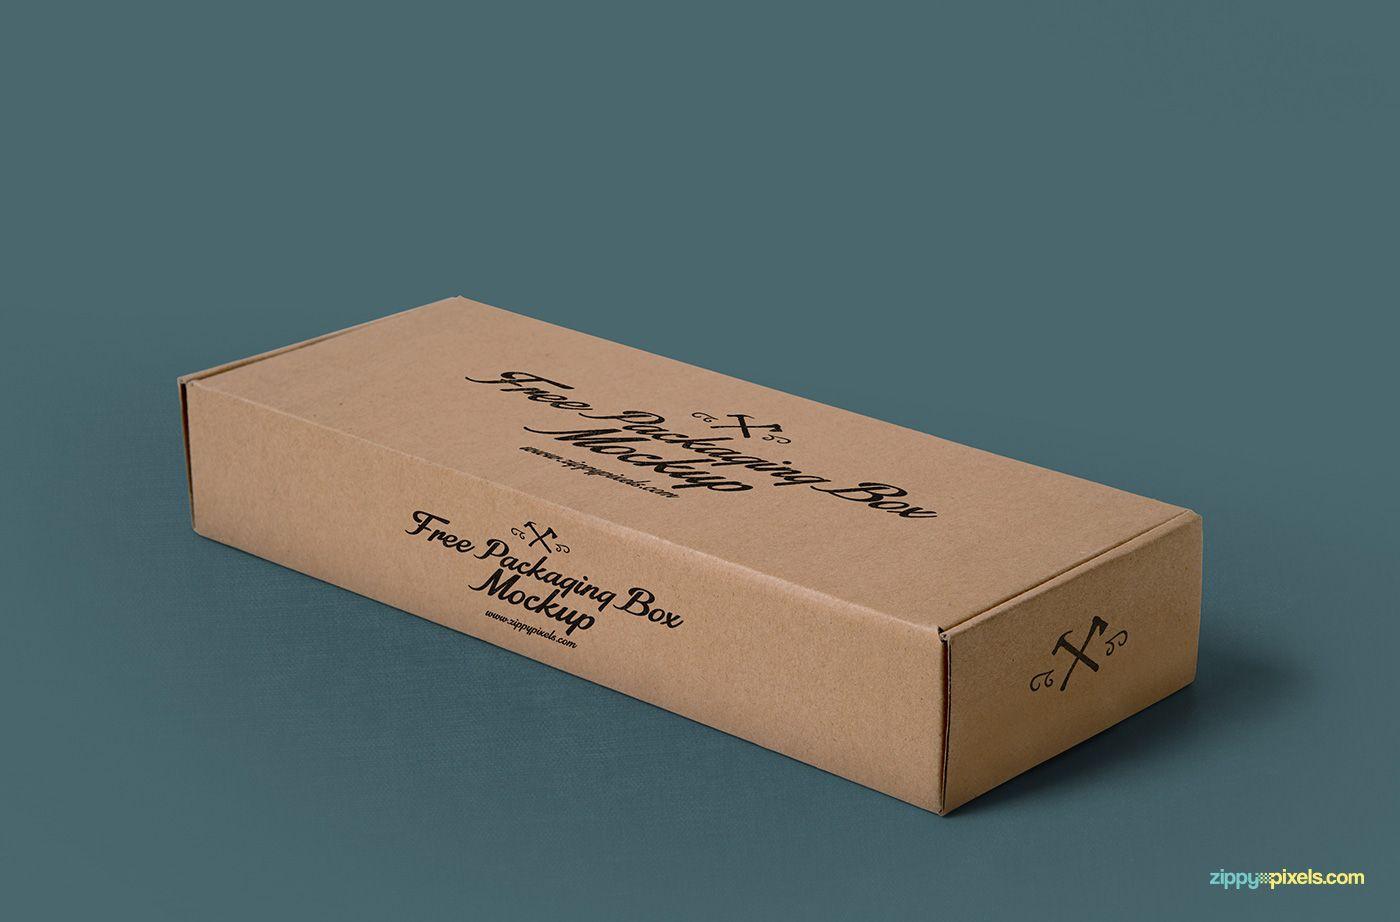 Download 3 Free Packaging Box Mockups On Behance Free Packaging Mockup Mockup Packaging Box Packaging Mockup